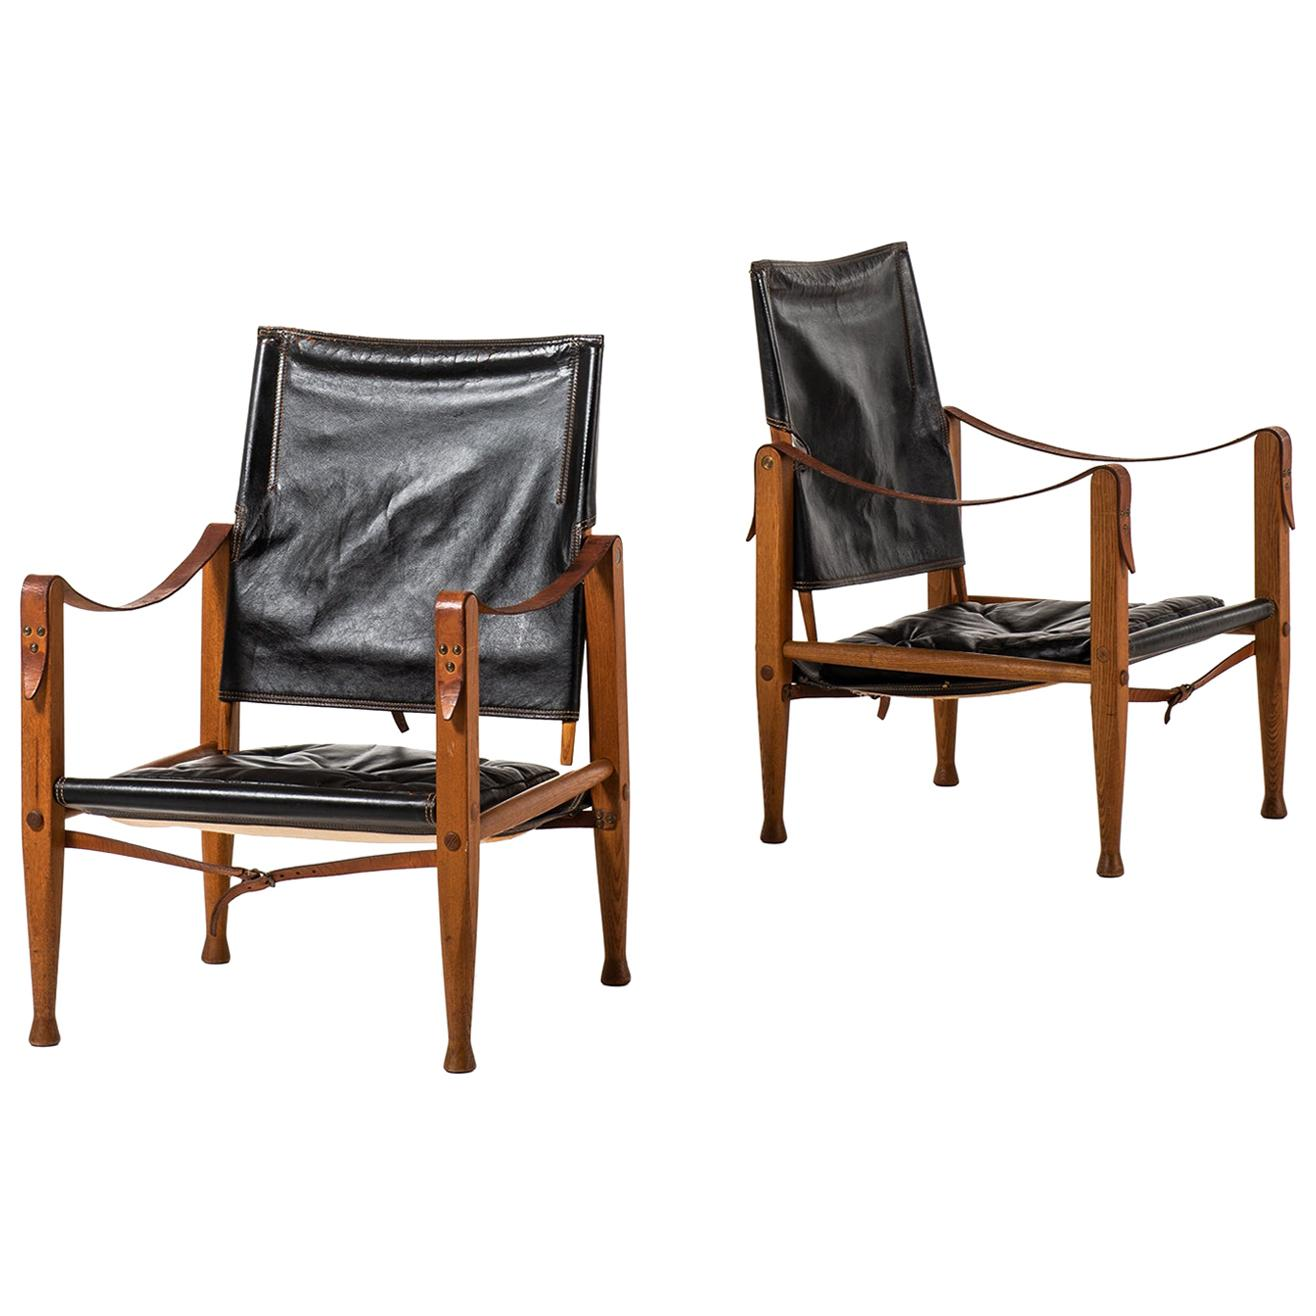 Kaare Klint Safari Chairs Produced by Rud Rasmussen in Denmark